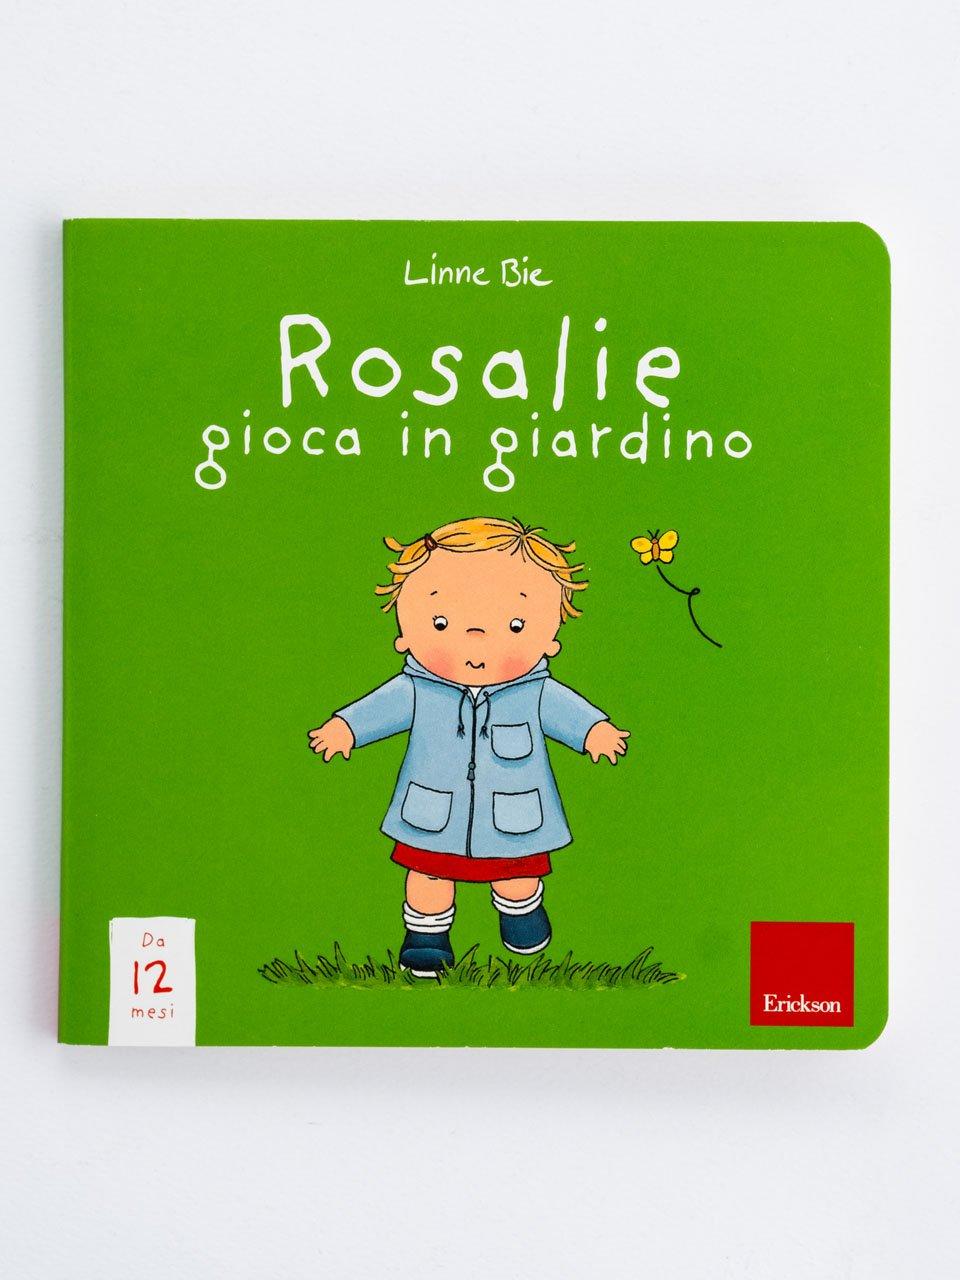 Rosalie gioca in giardino - Educatore / Coordinatore asilo nido - Erickson